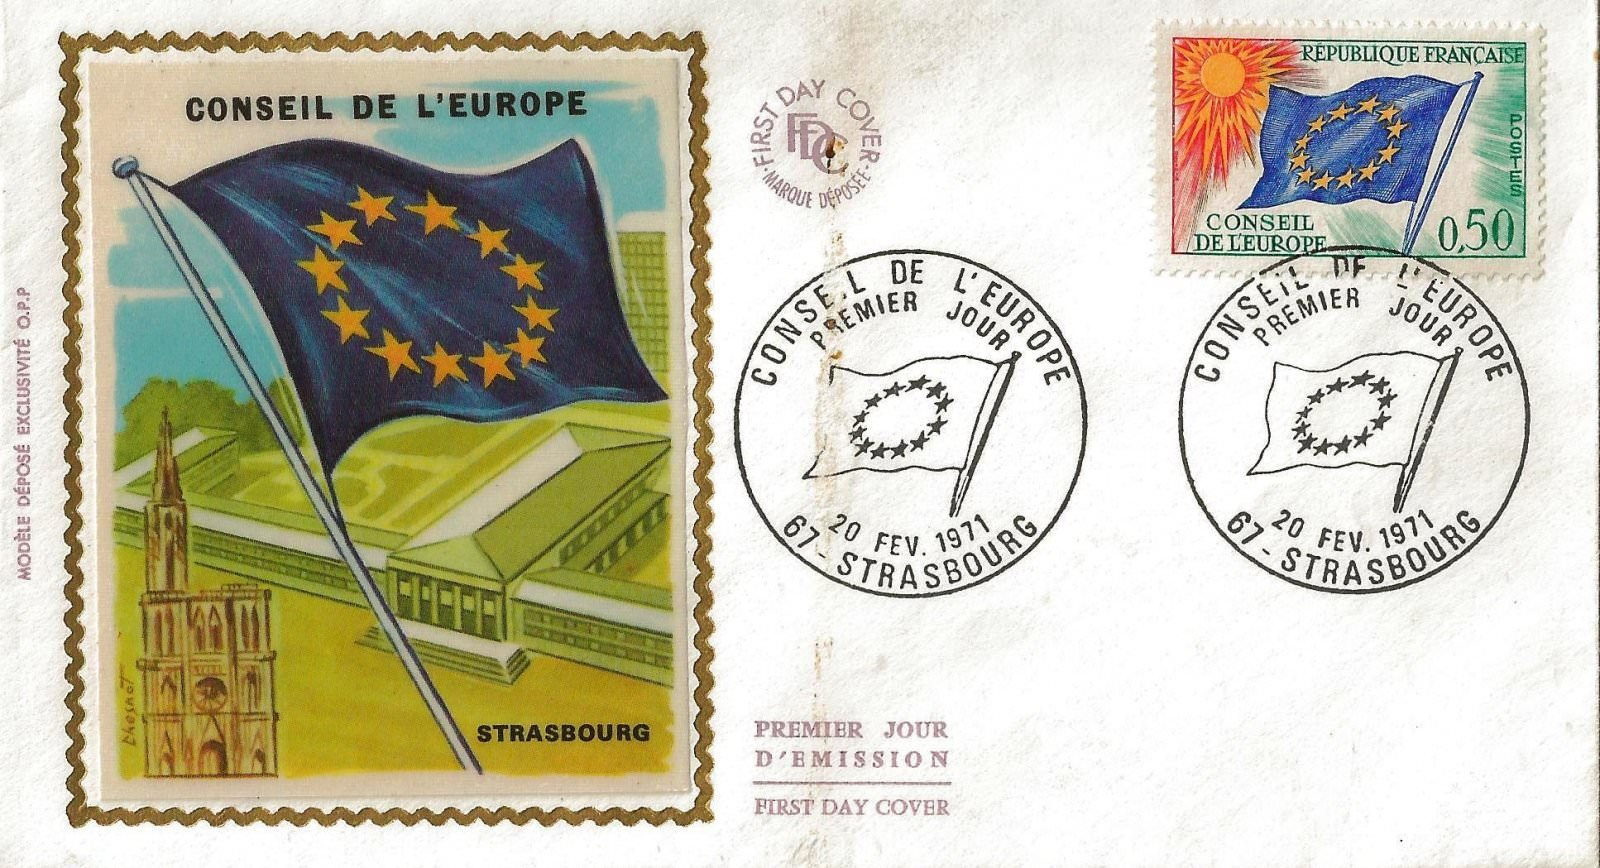 1971 conseil de europe